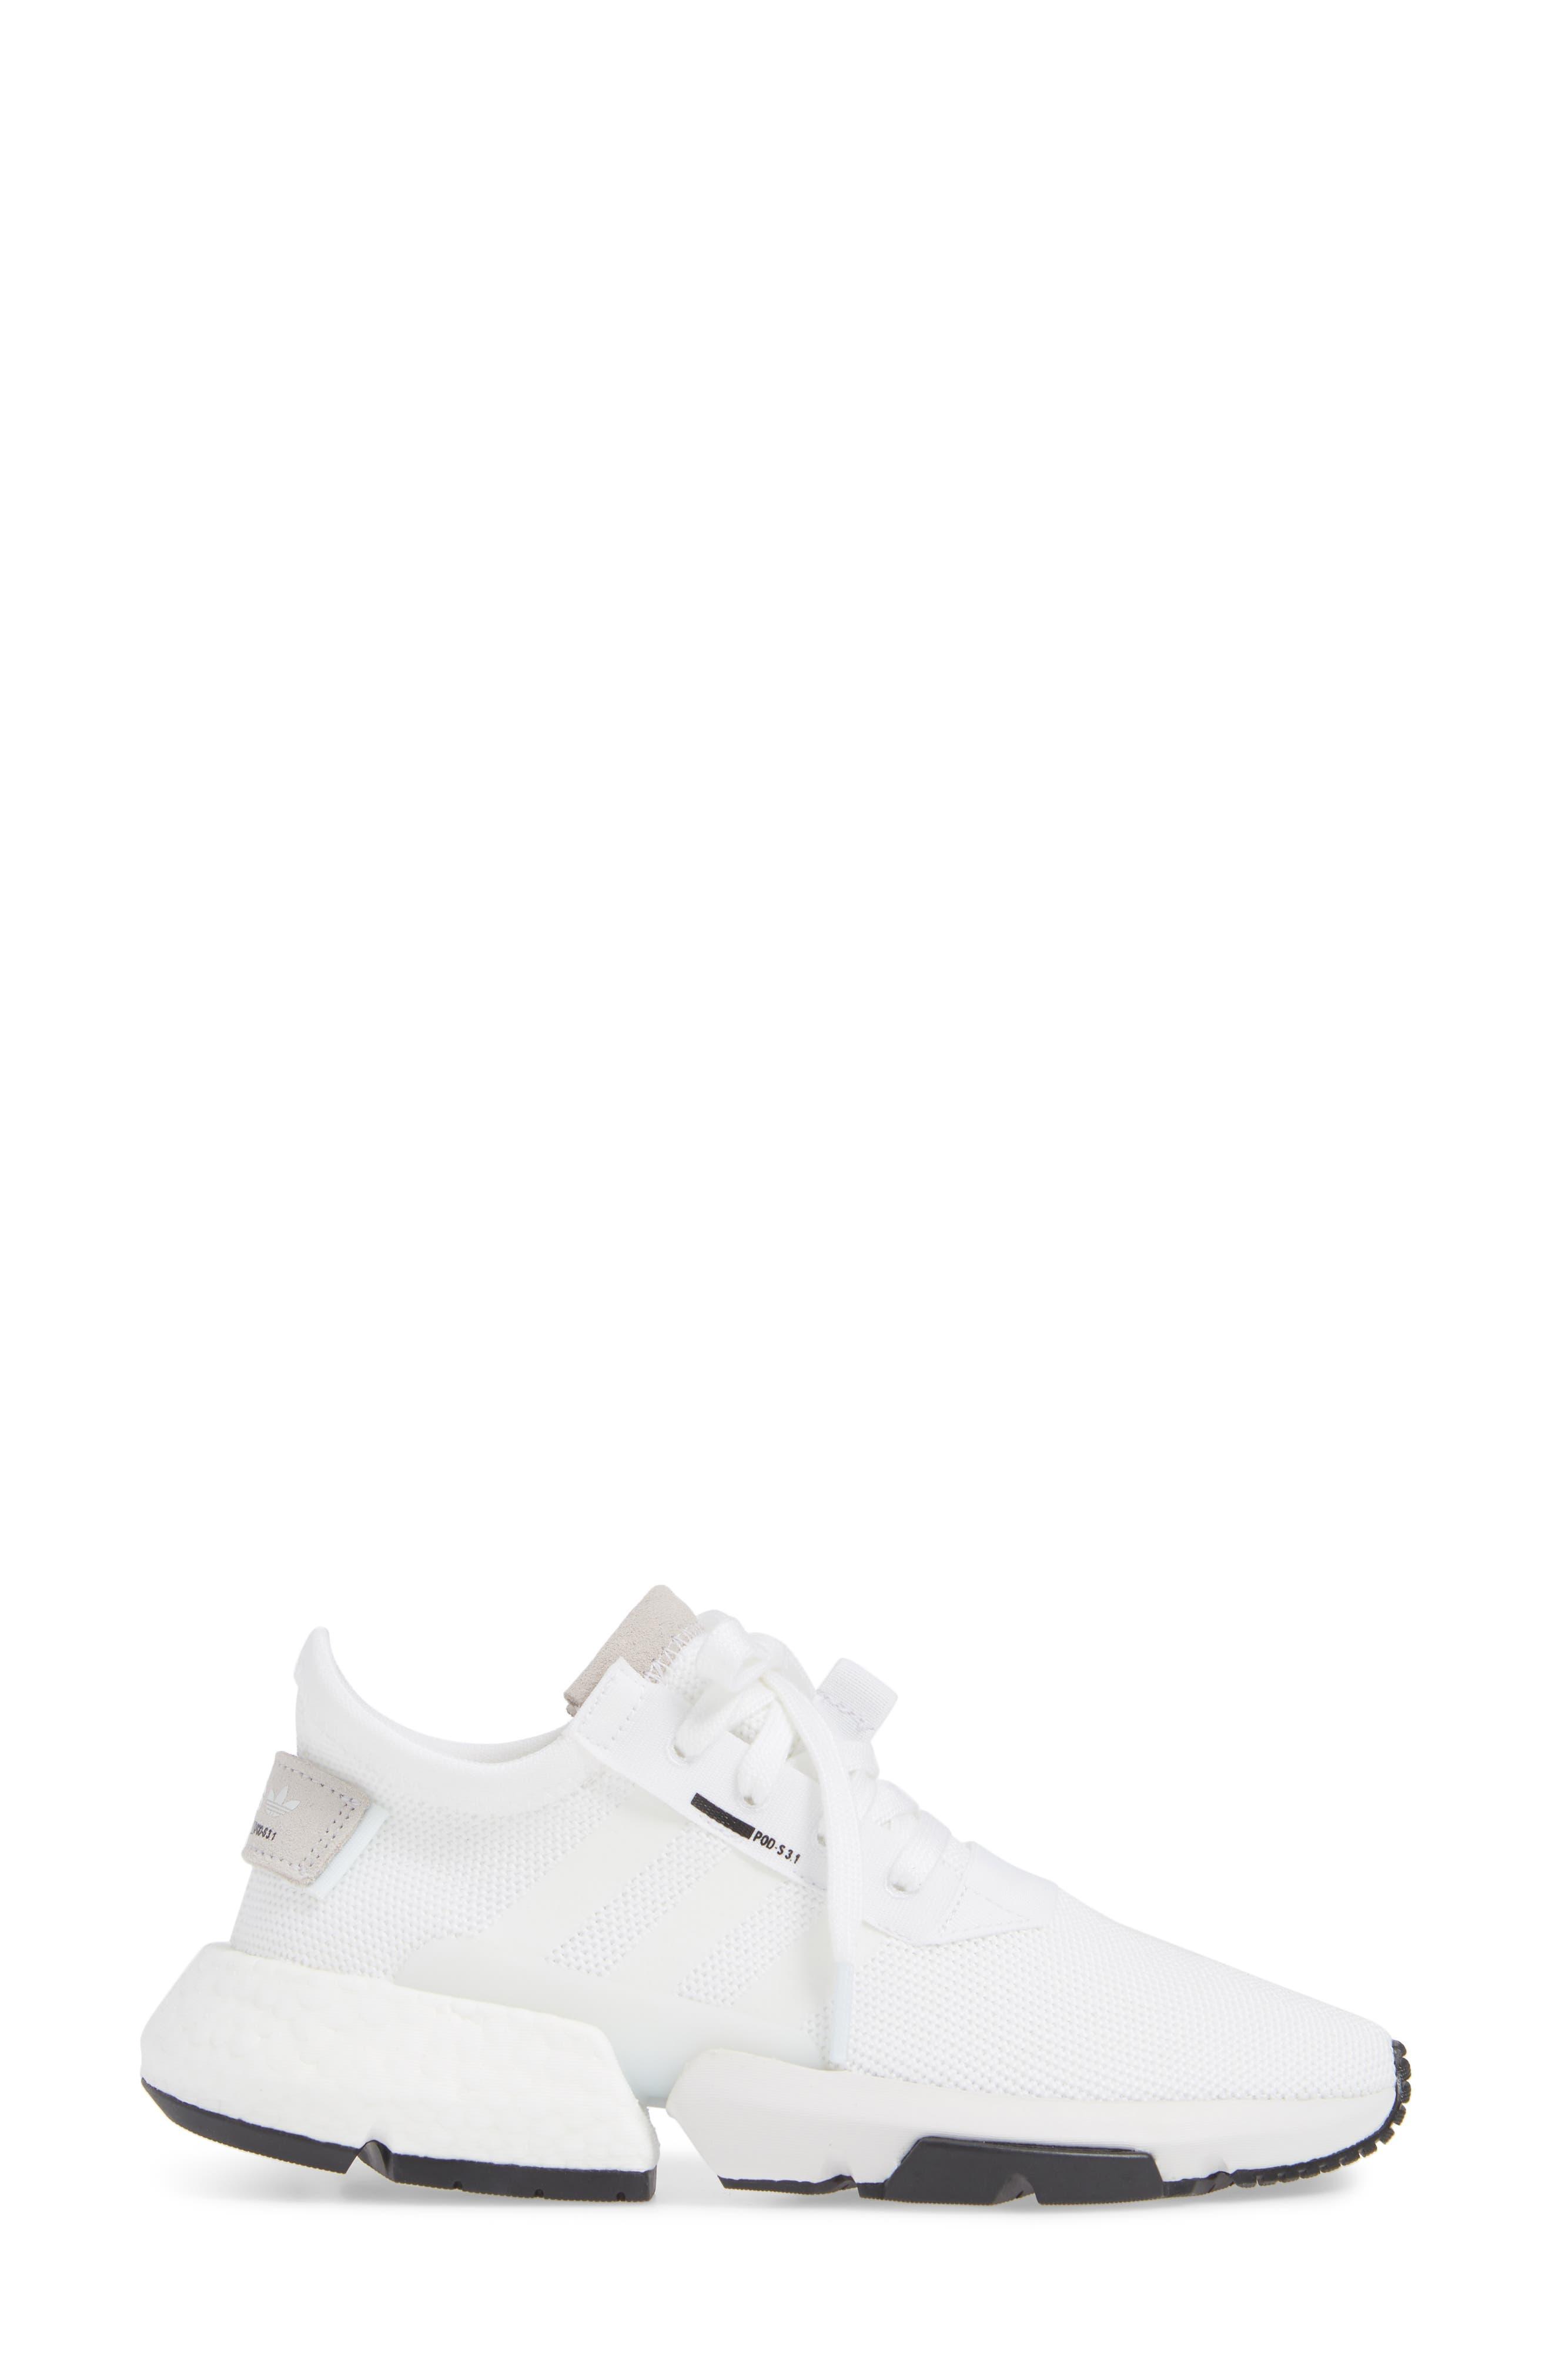 Pod S3.1 Sneaker,                             Alternate thumbnail 3, color,                             WHITE/ WHITE/ CORE BLACK